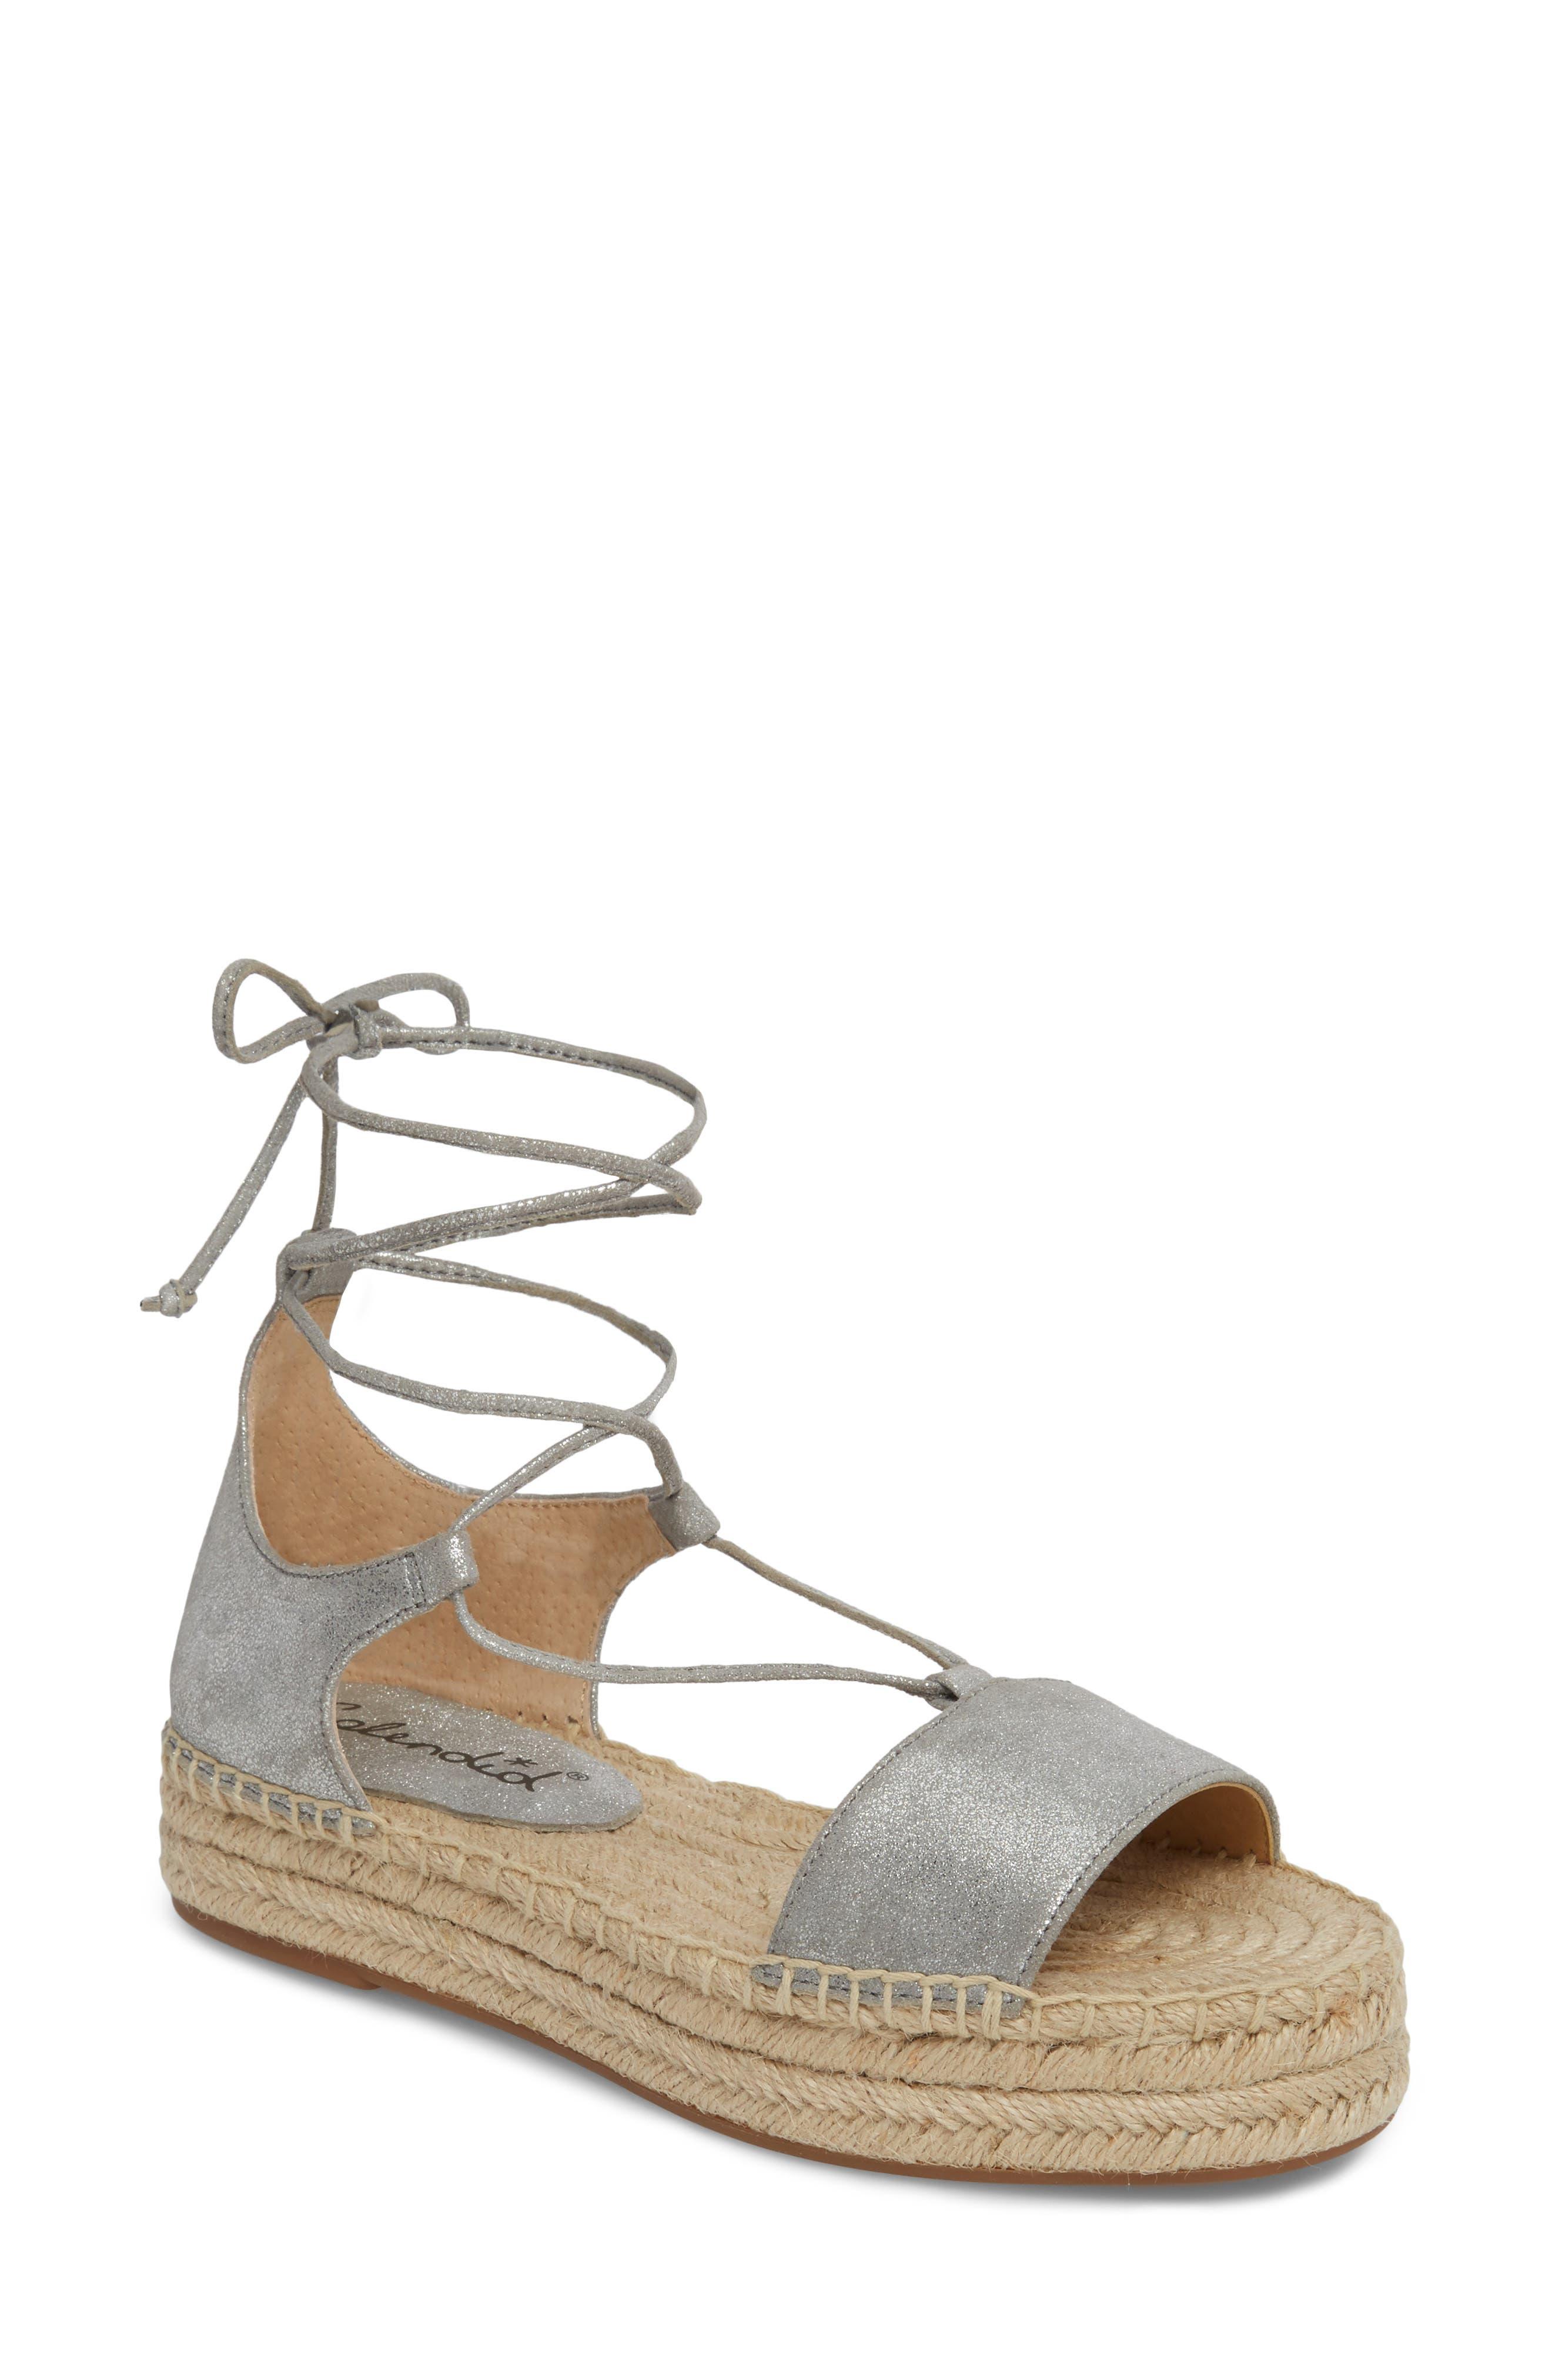 Fernanda Wraparound Platform Sandal,                         Main,                         color, SILVER SUEDE